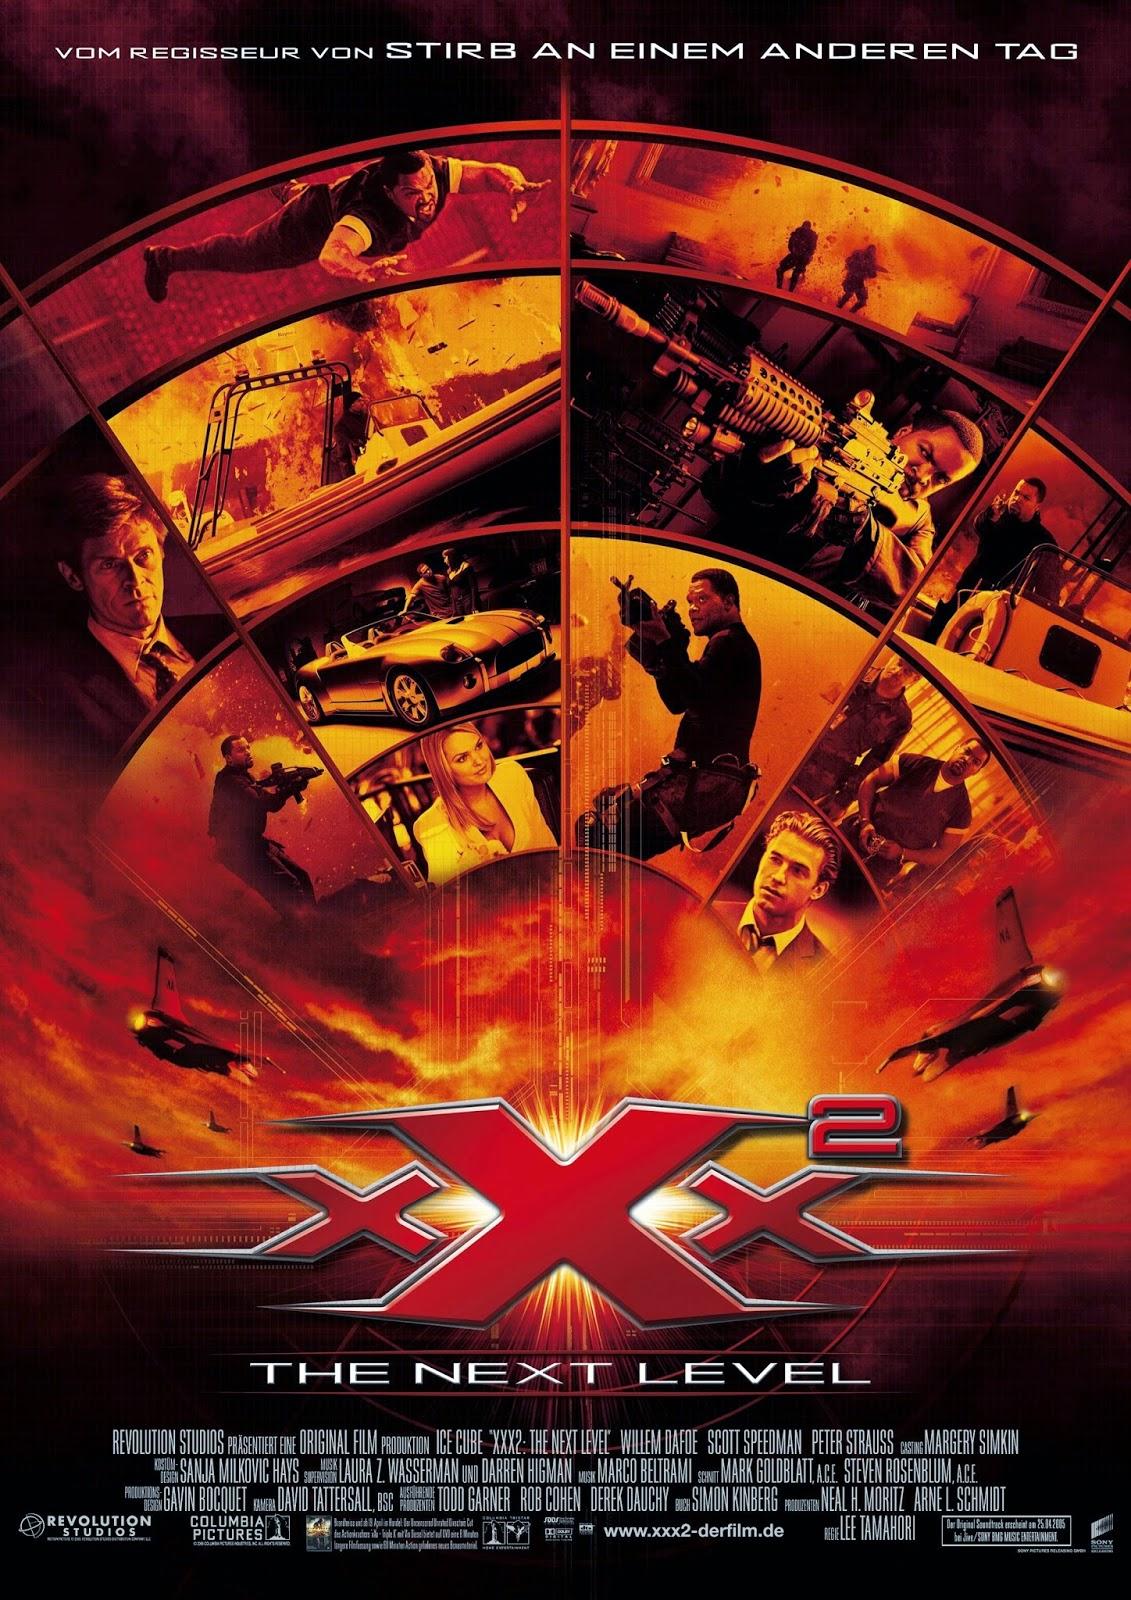 Triple X 2 ทริปเปิ้ลเอ๊กซ์ 2 พยัคฆ์ร้ายพันธุ์ดุ [HD][พากย์ไทย]